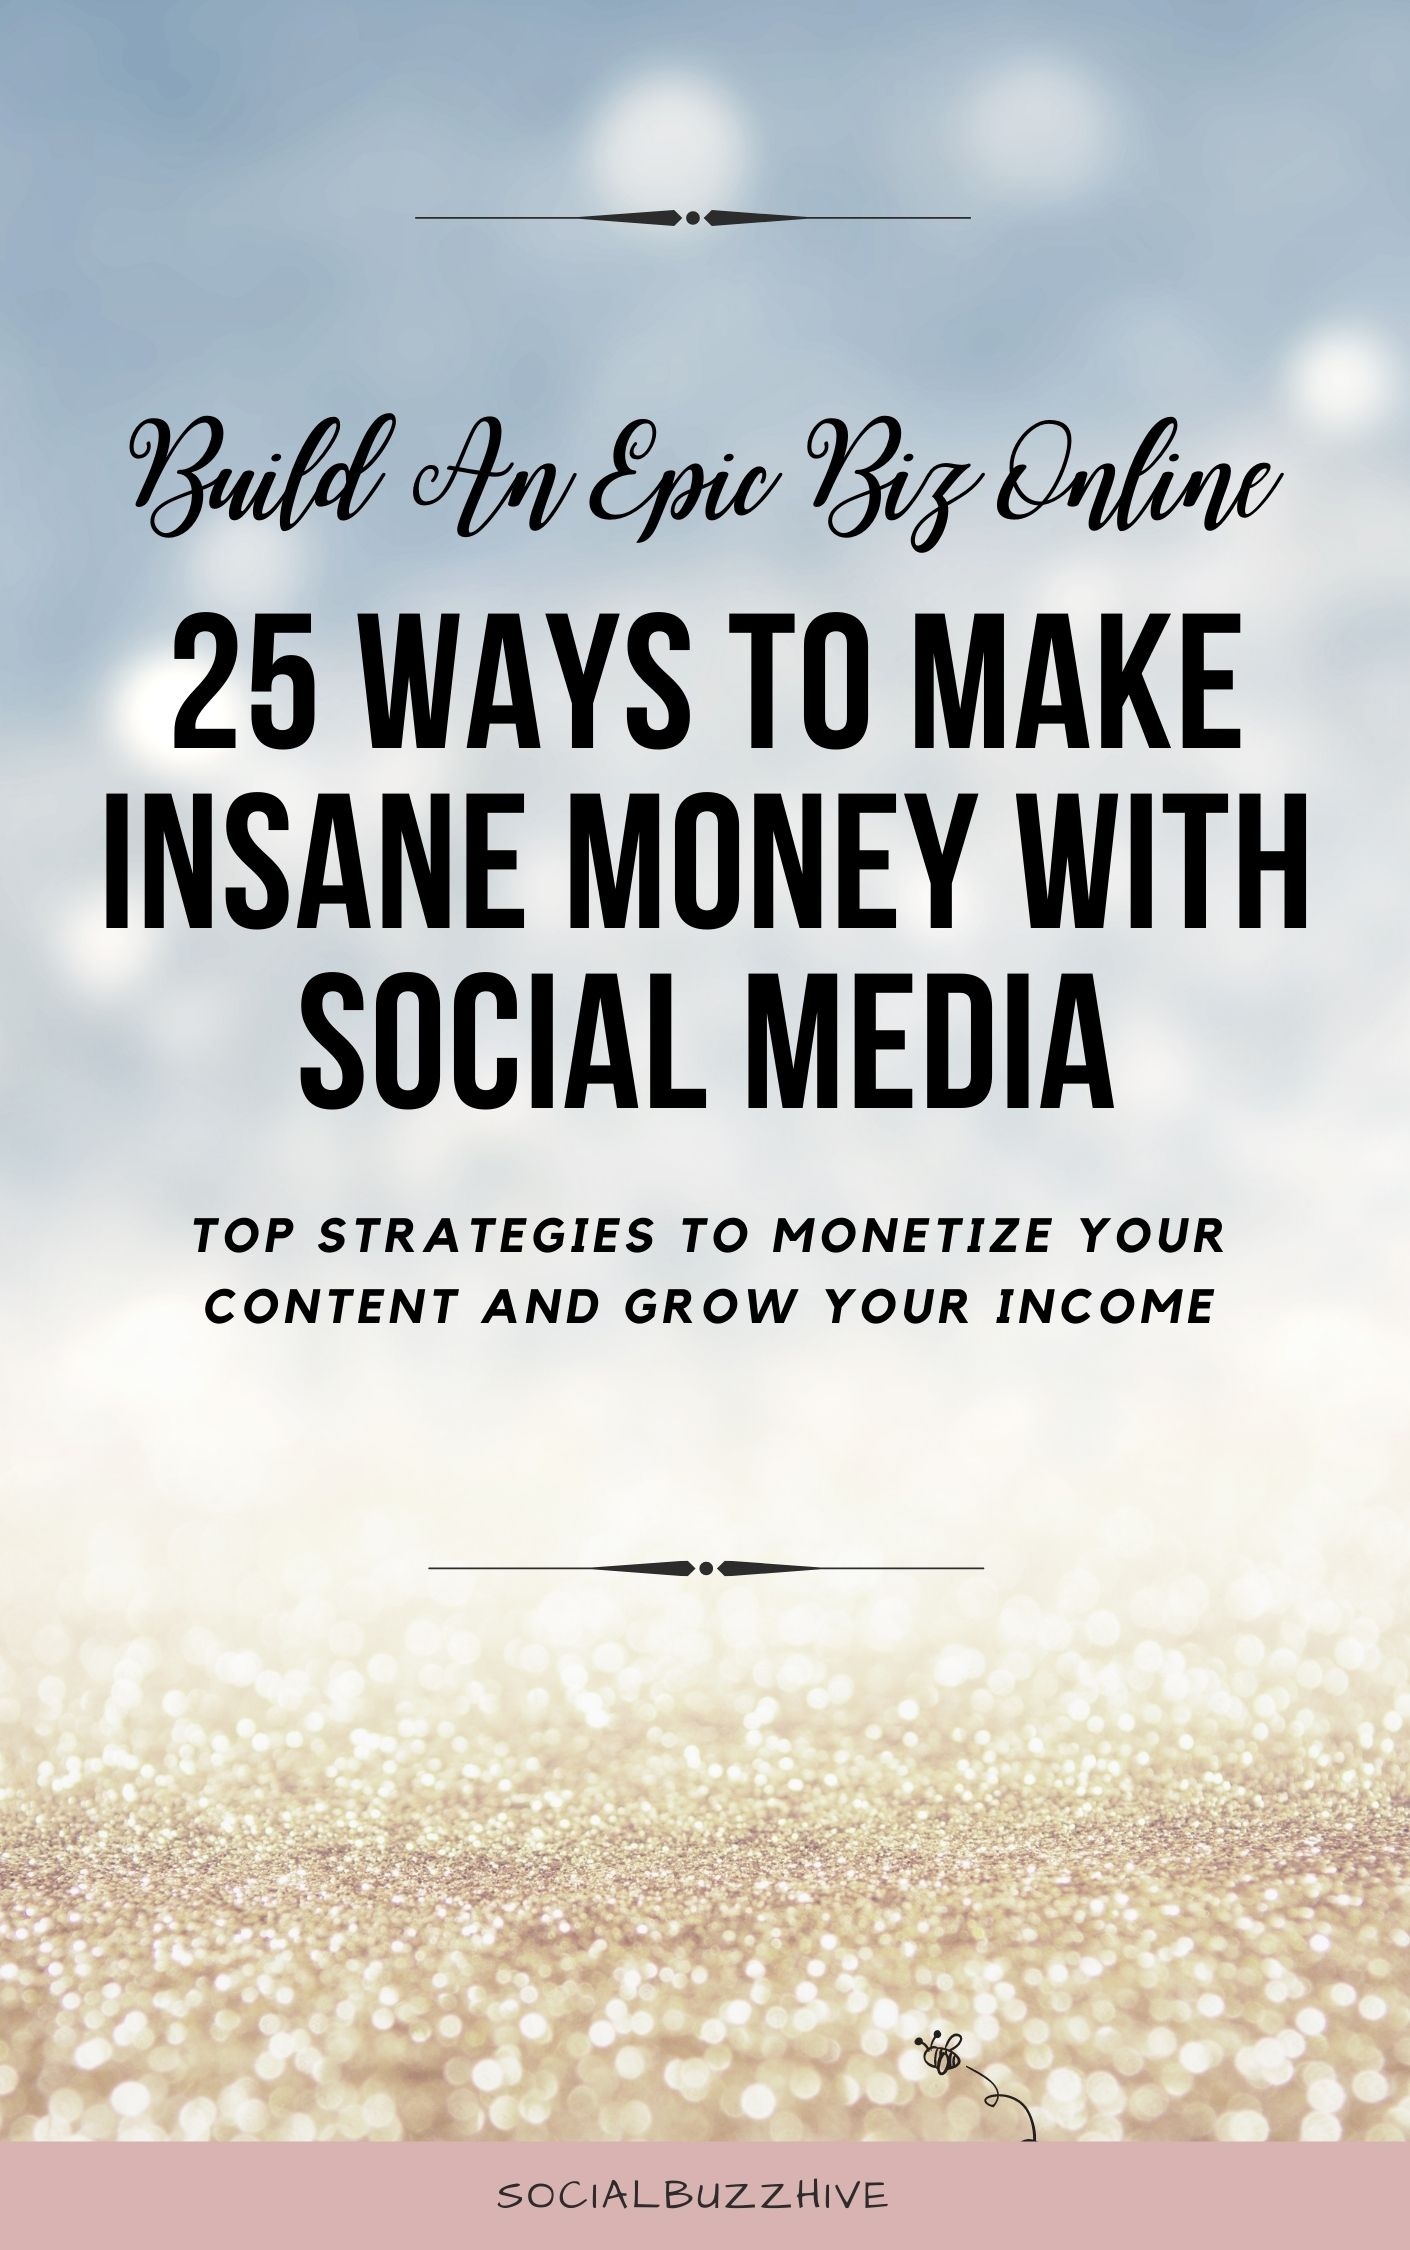 25 ways to make insane money with social media